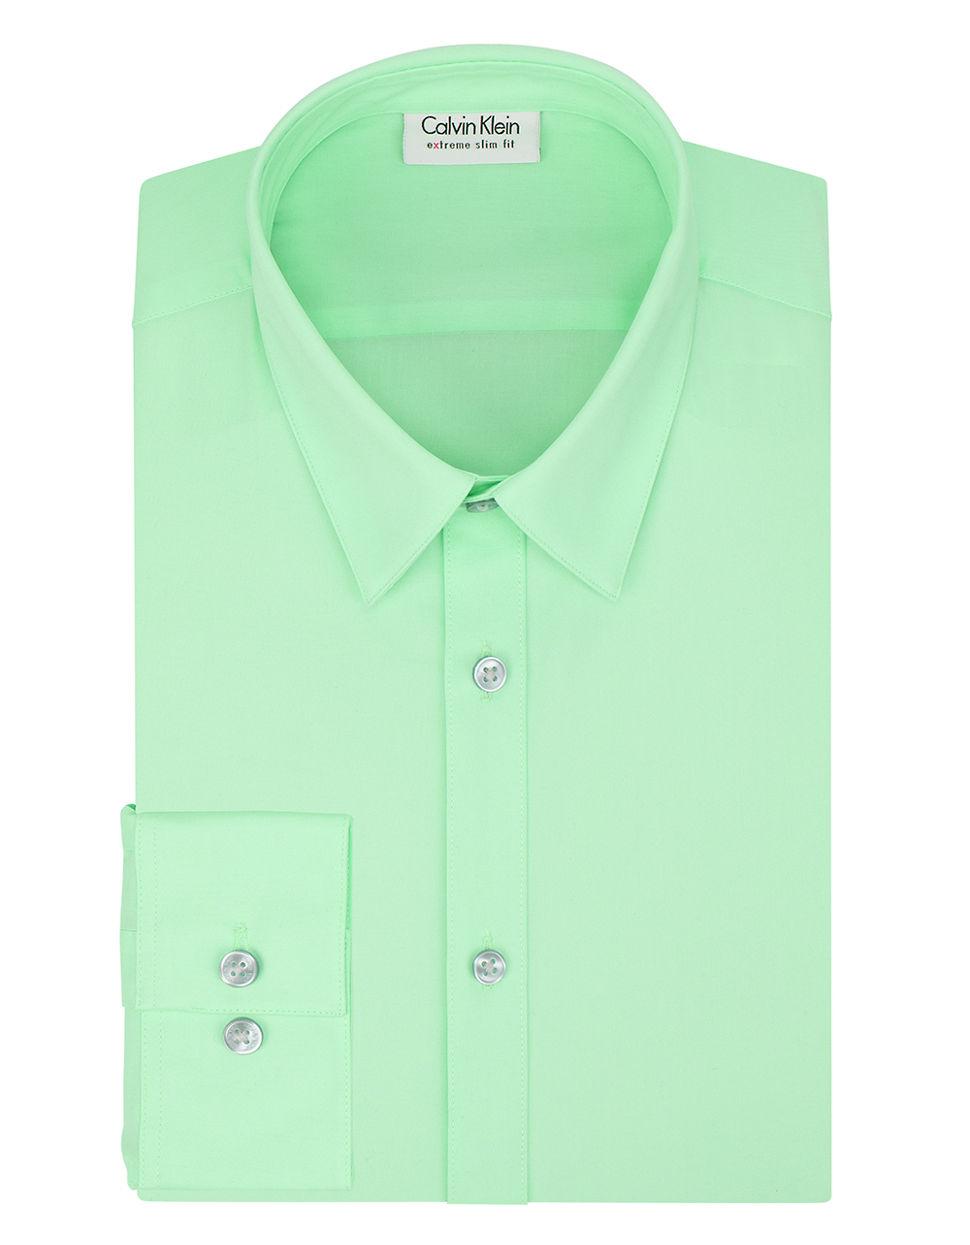 Calvin Klein Slim Fit Dress Shirt In Green For Men Mint